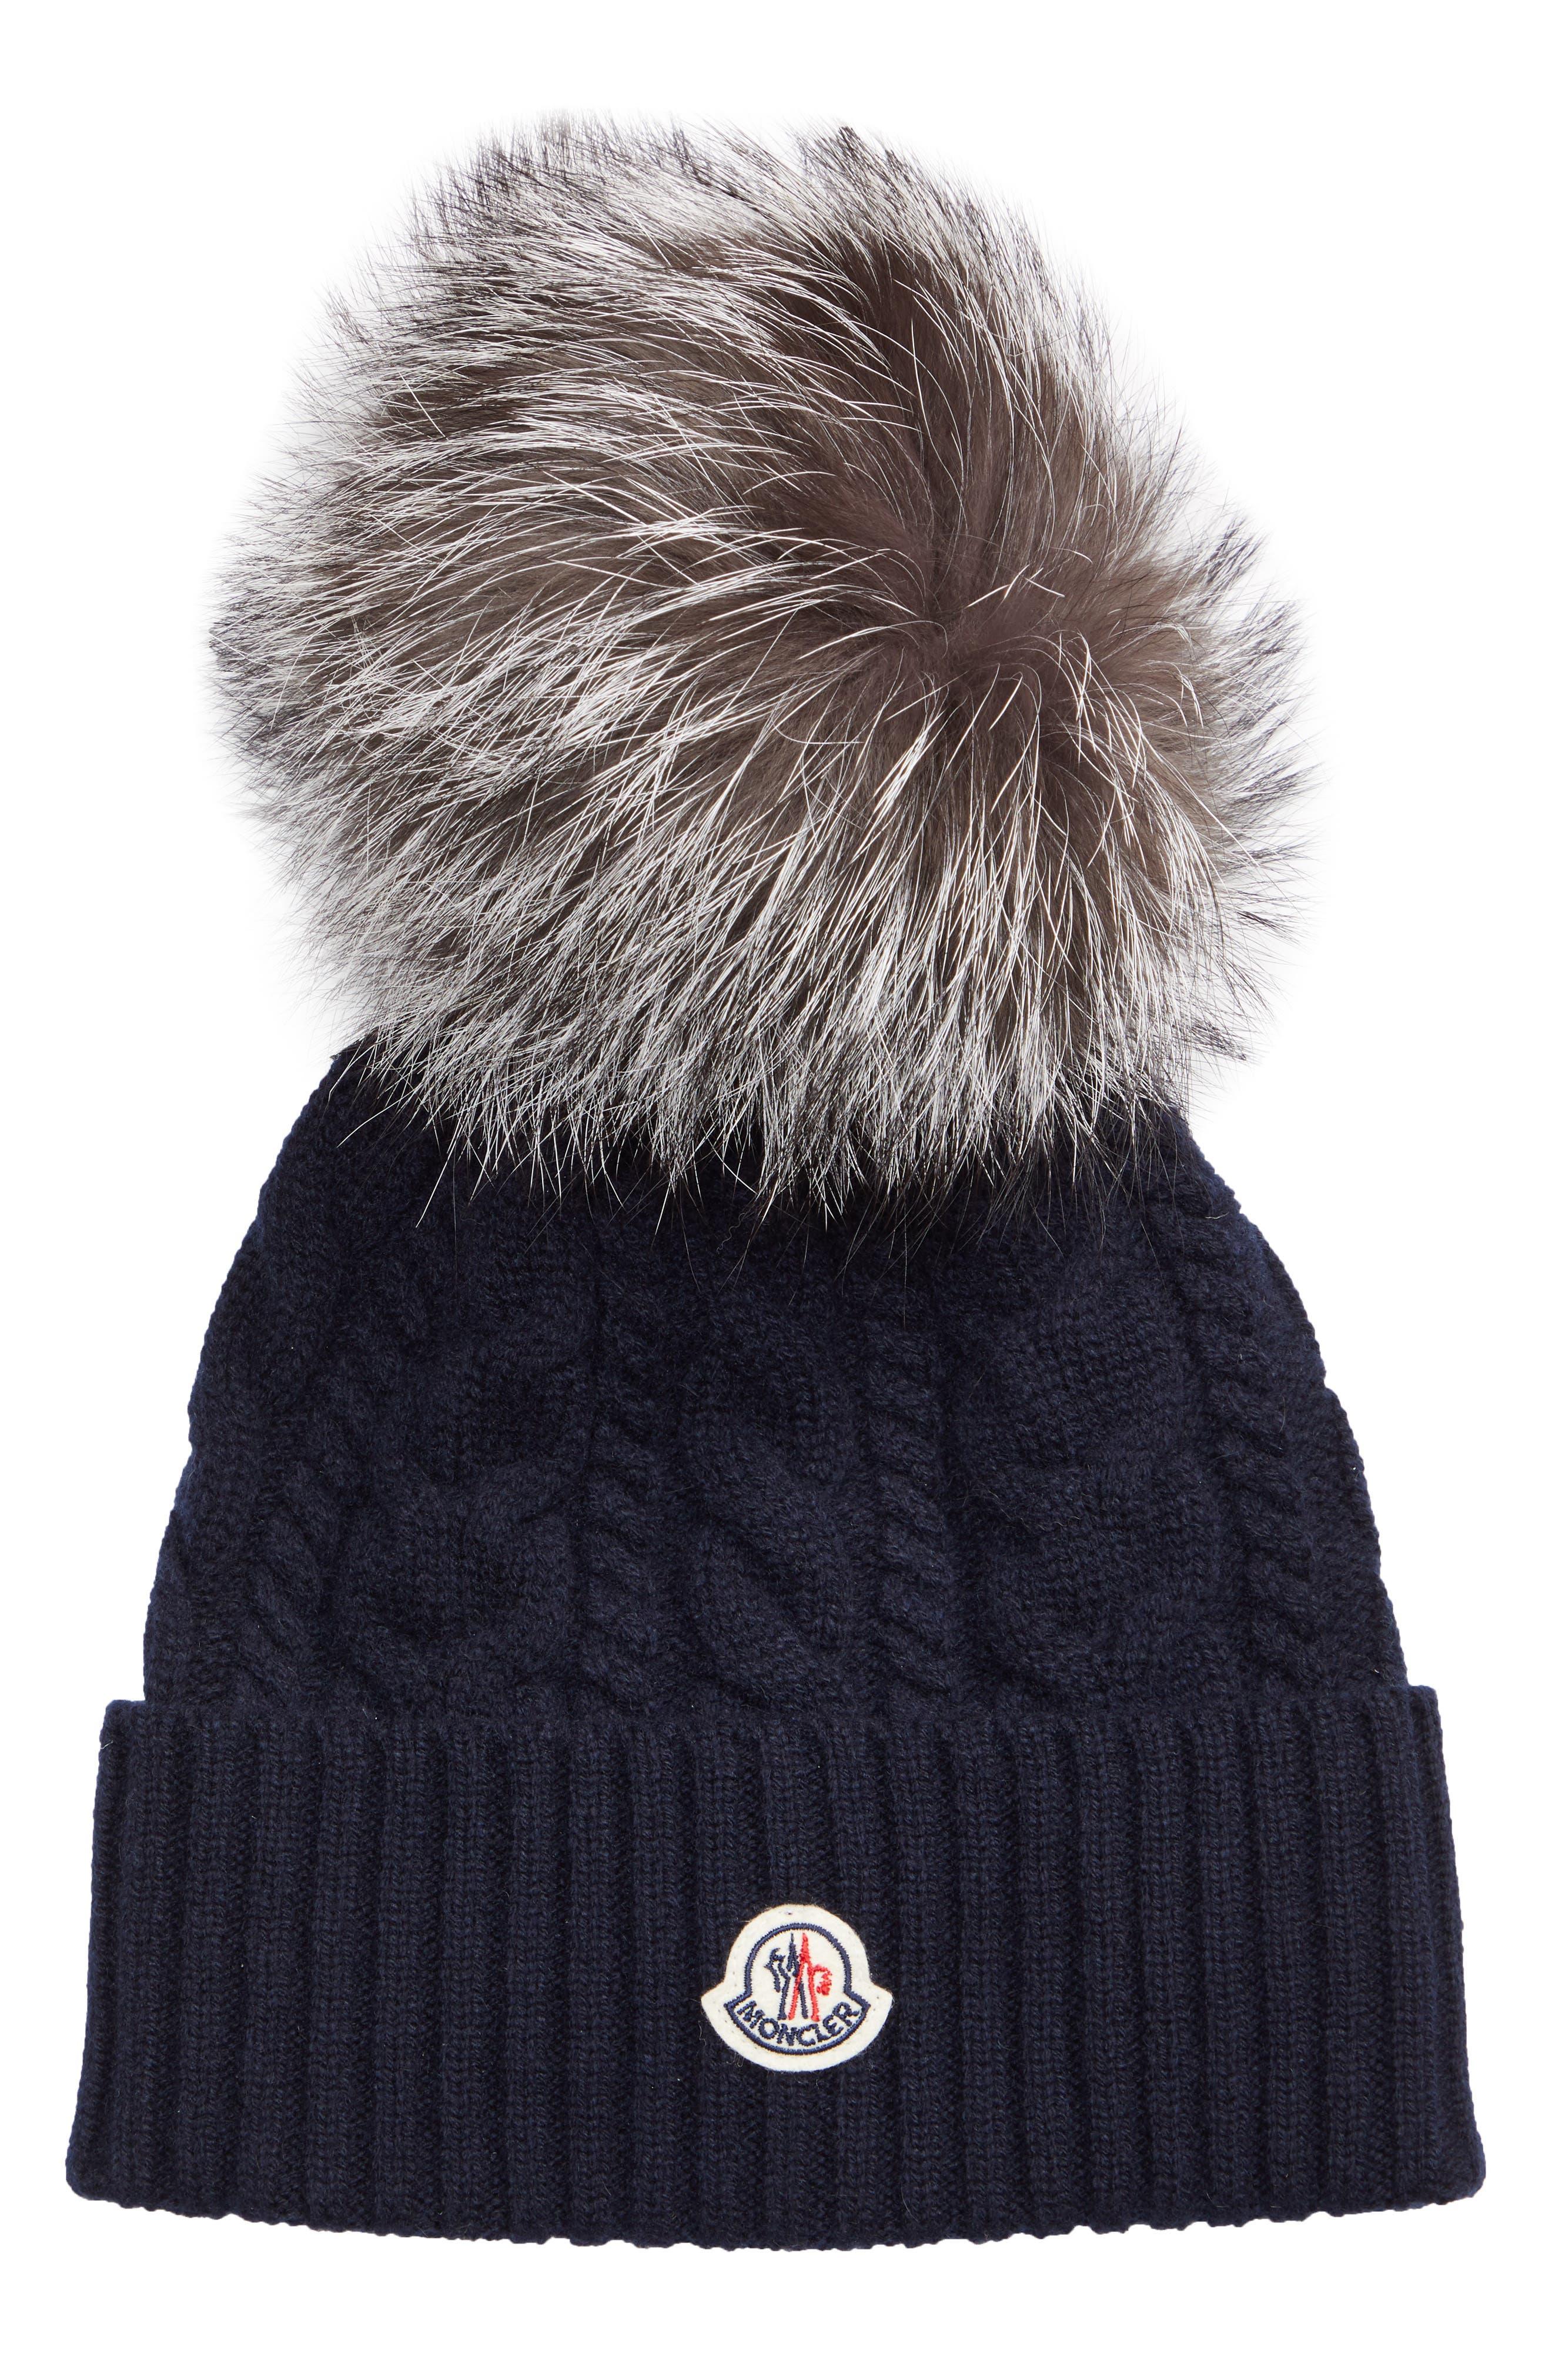 MONCLER, Genuine Fox Fur Pom Wool Beanie, Main thumbnail 1, color, NAVY